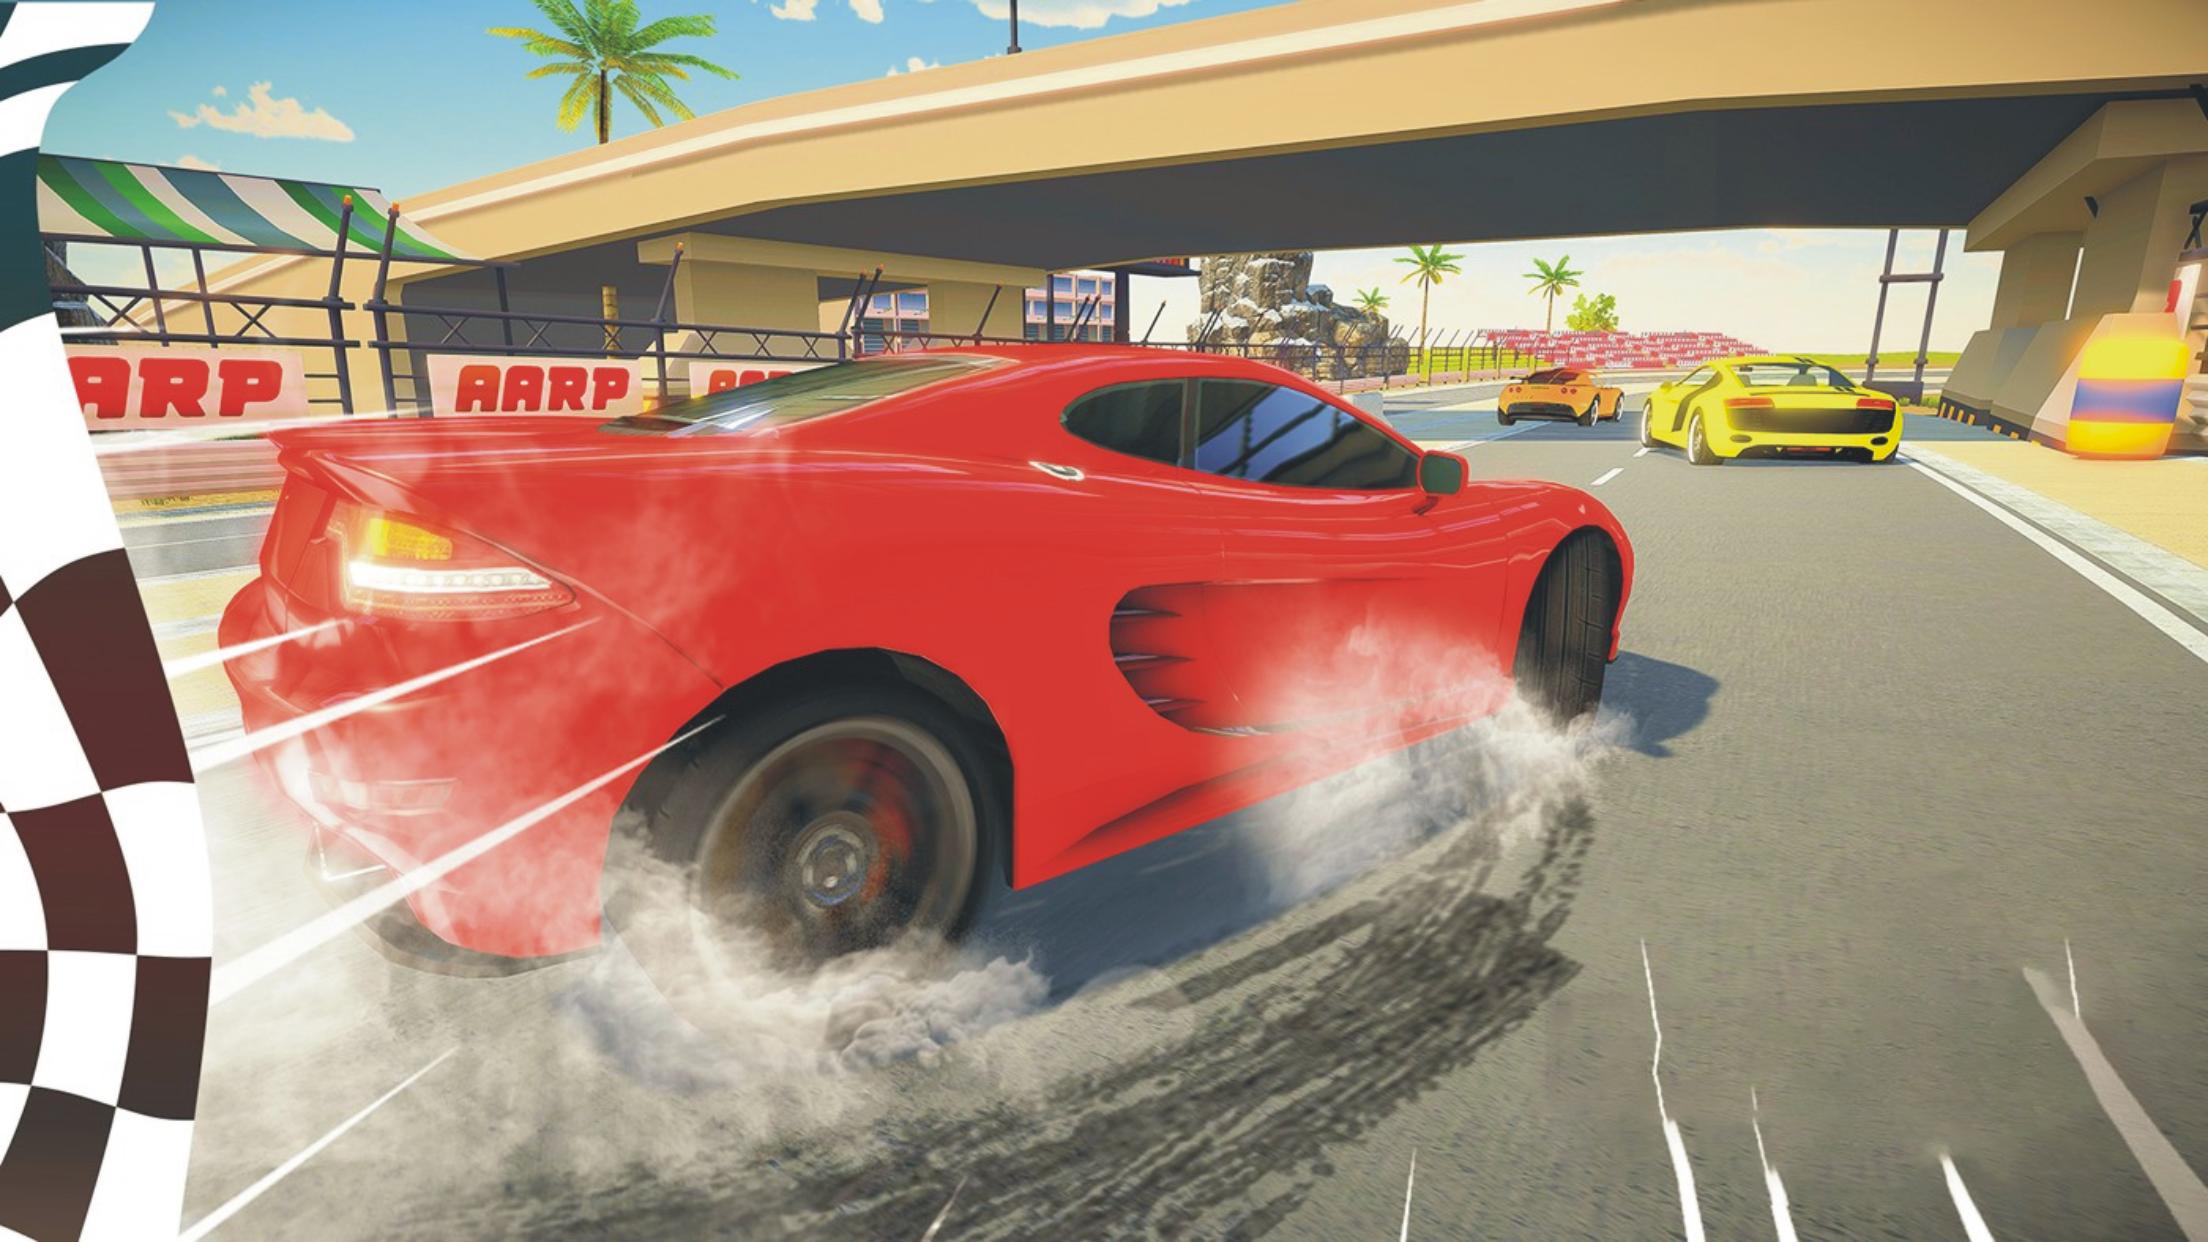 Https Apps Apple Com Us App Latest Sport Car 3d No 1 Game Id1495823276 Sports Cars Car Car Games